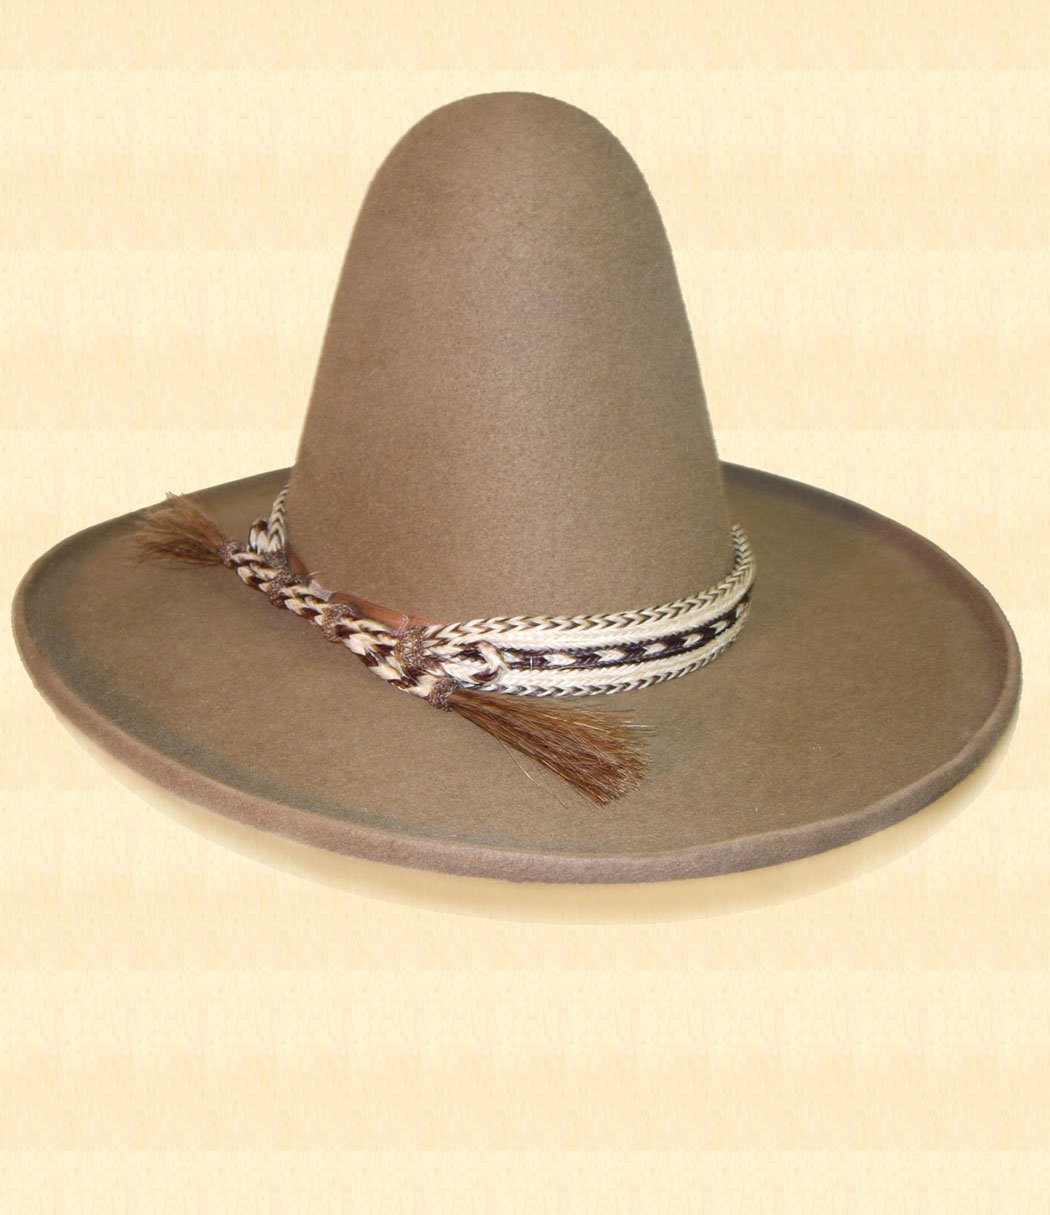 The Real Sugar Loaf 10x Fur Felt Hat